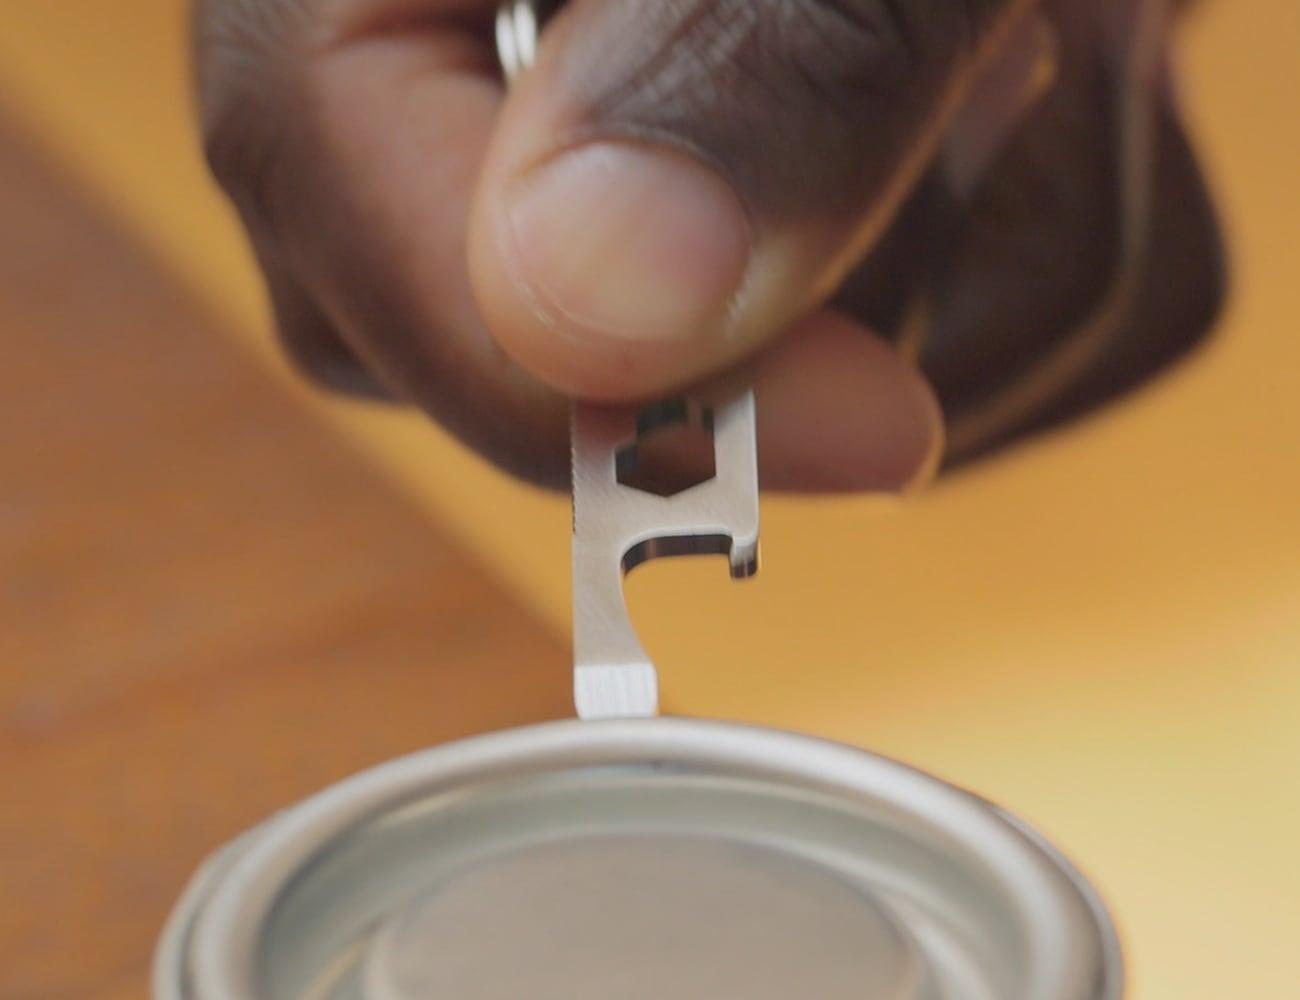 Nopi 9-in-1 Micro Key Tool